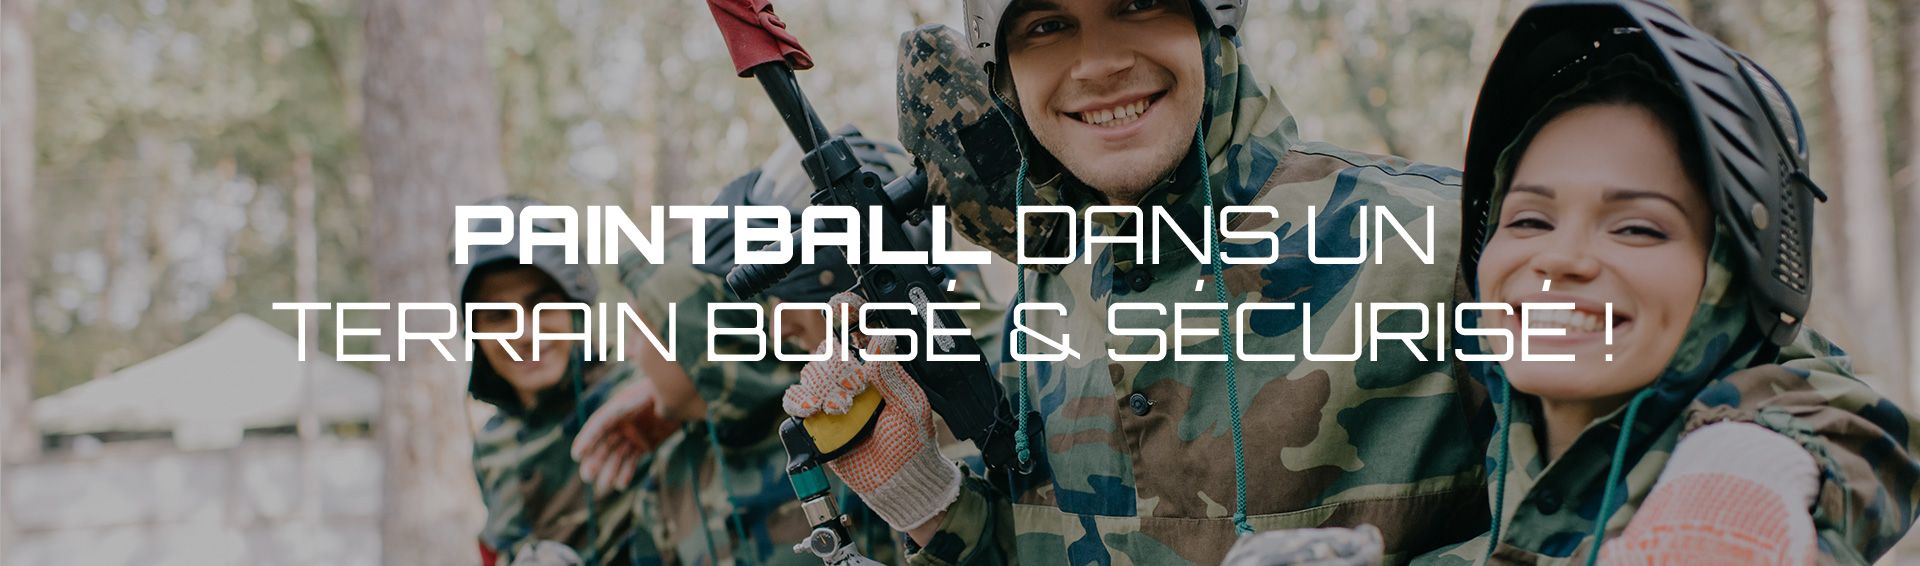 Paintball loisir Haute-Vienne : ZONE 87